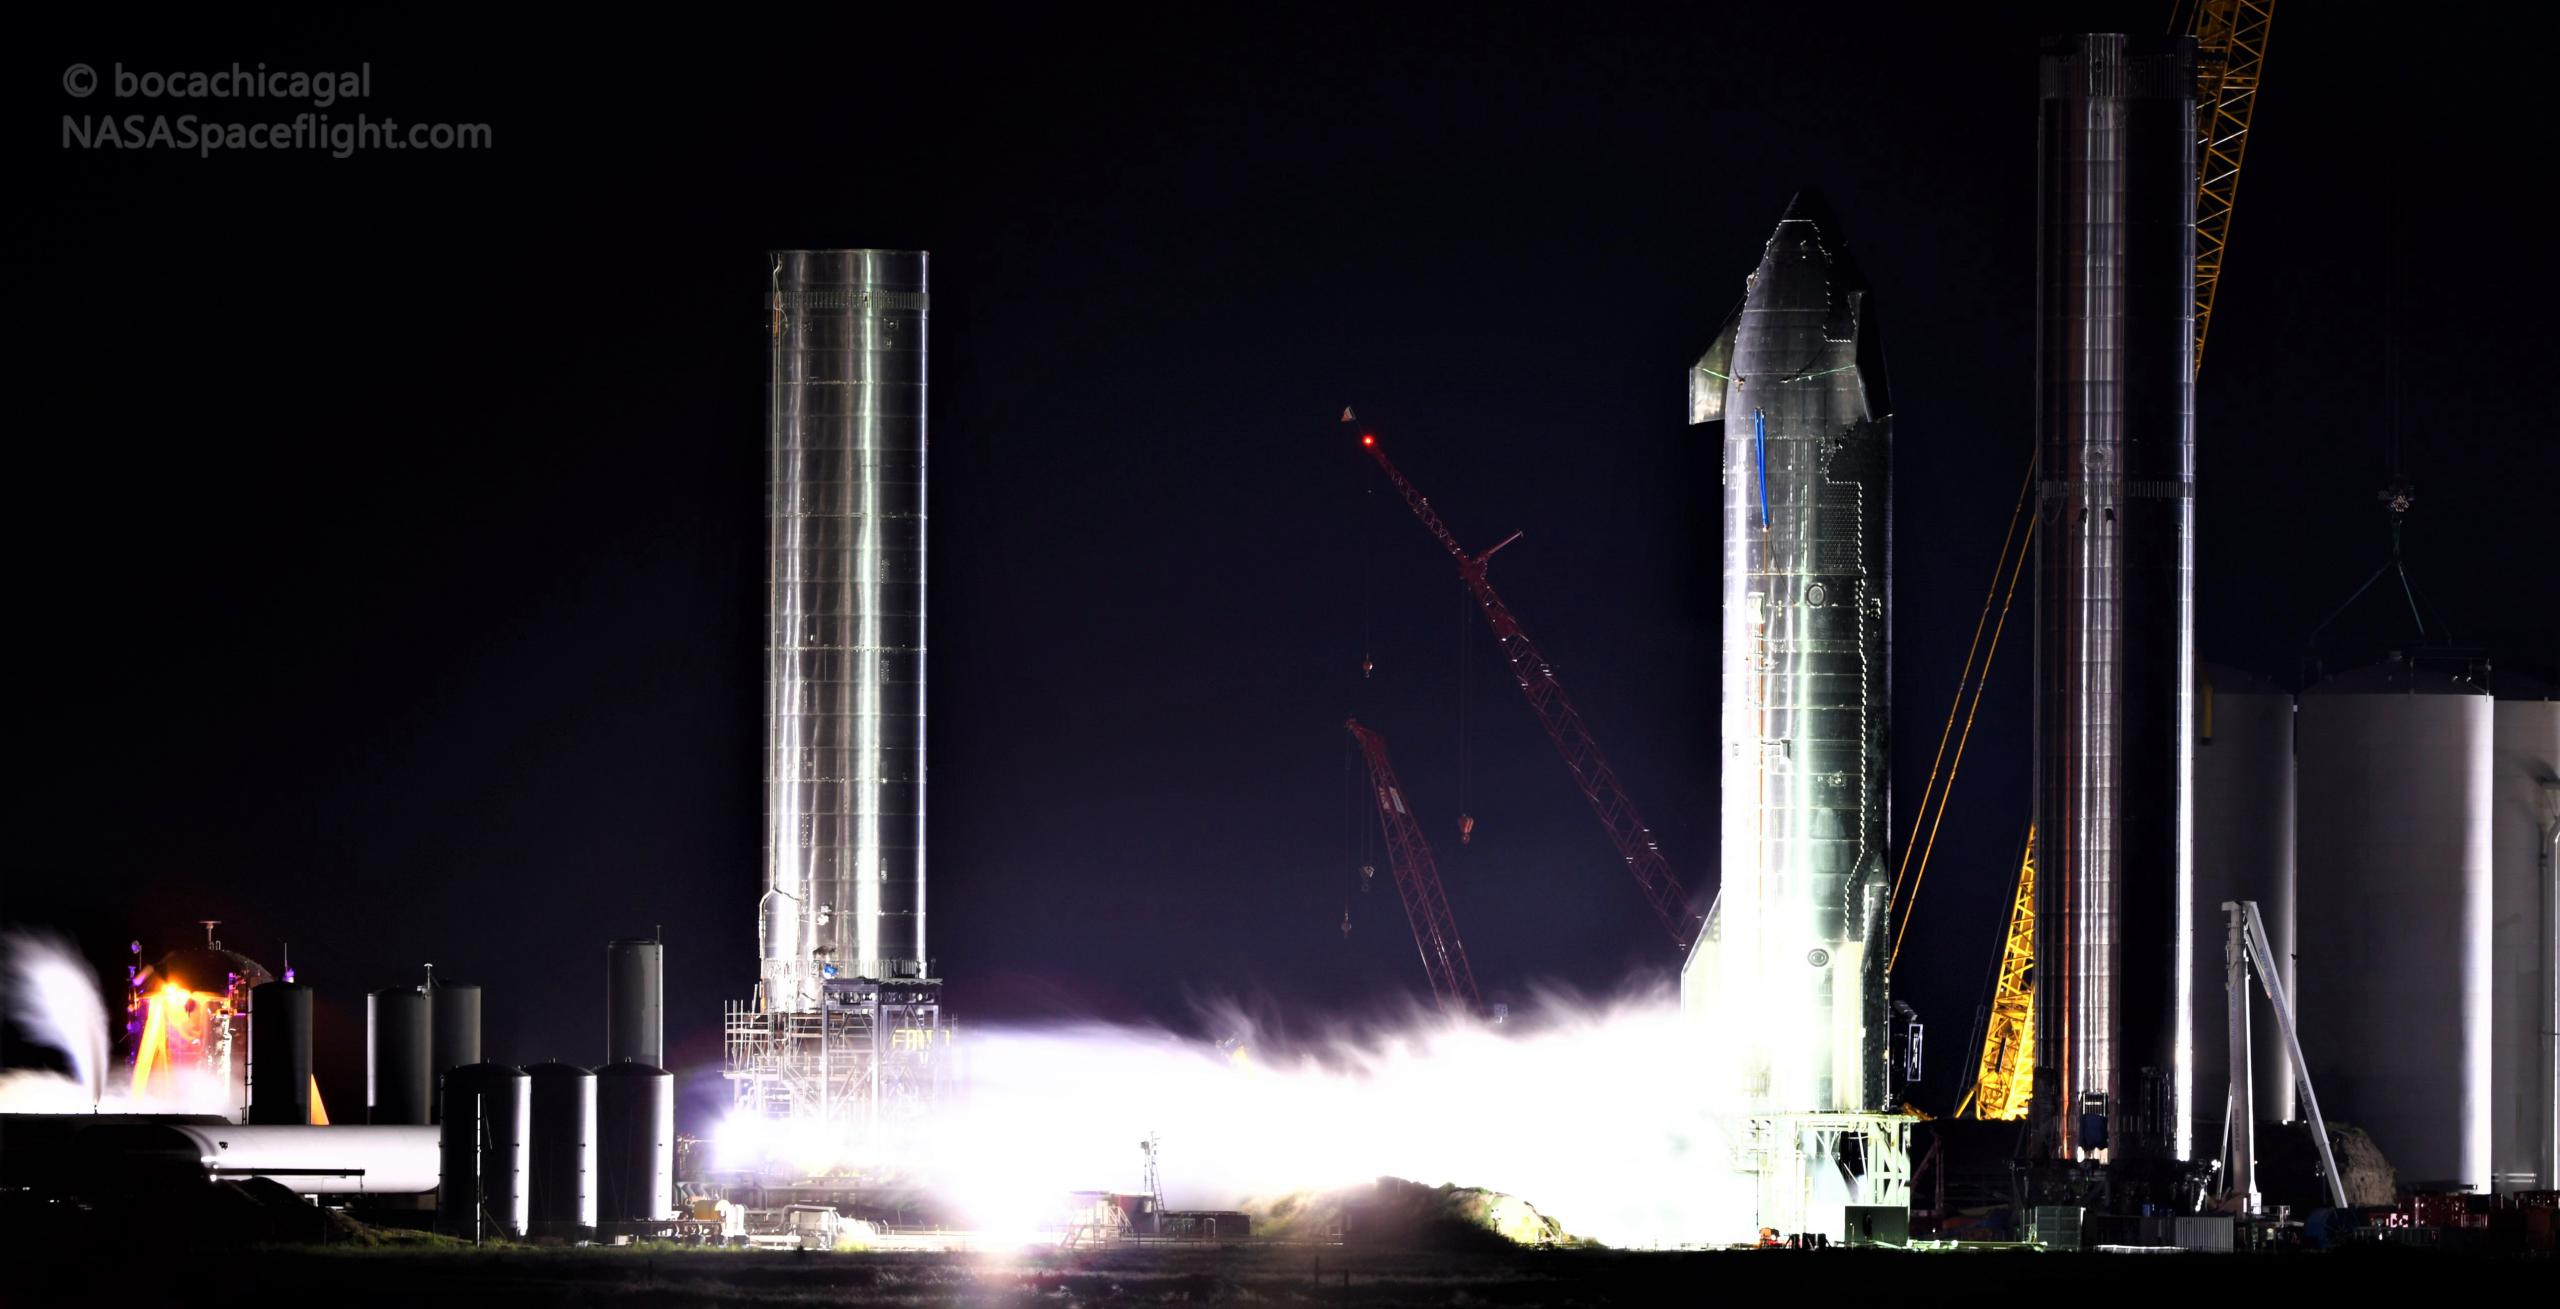 Starbase 092721 (NASASpaceflight – bocachicagal) S20 testing 1 crop (c)